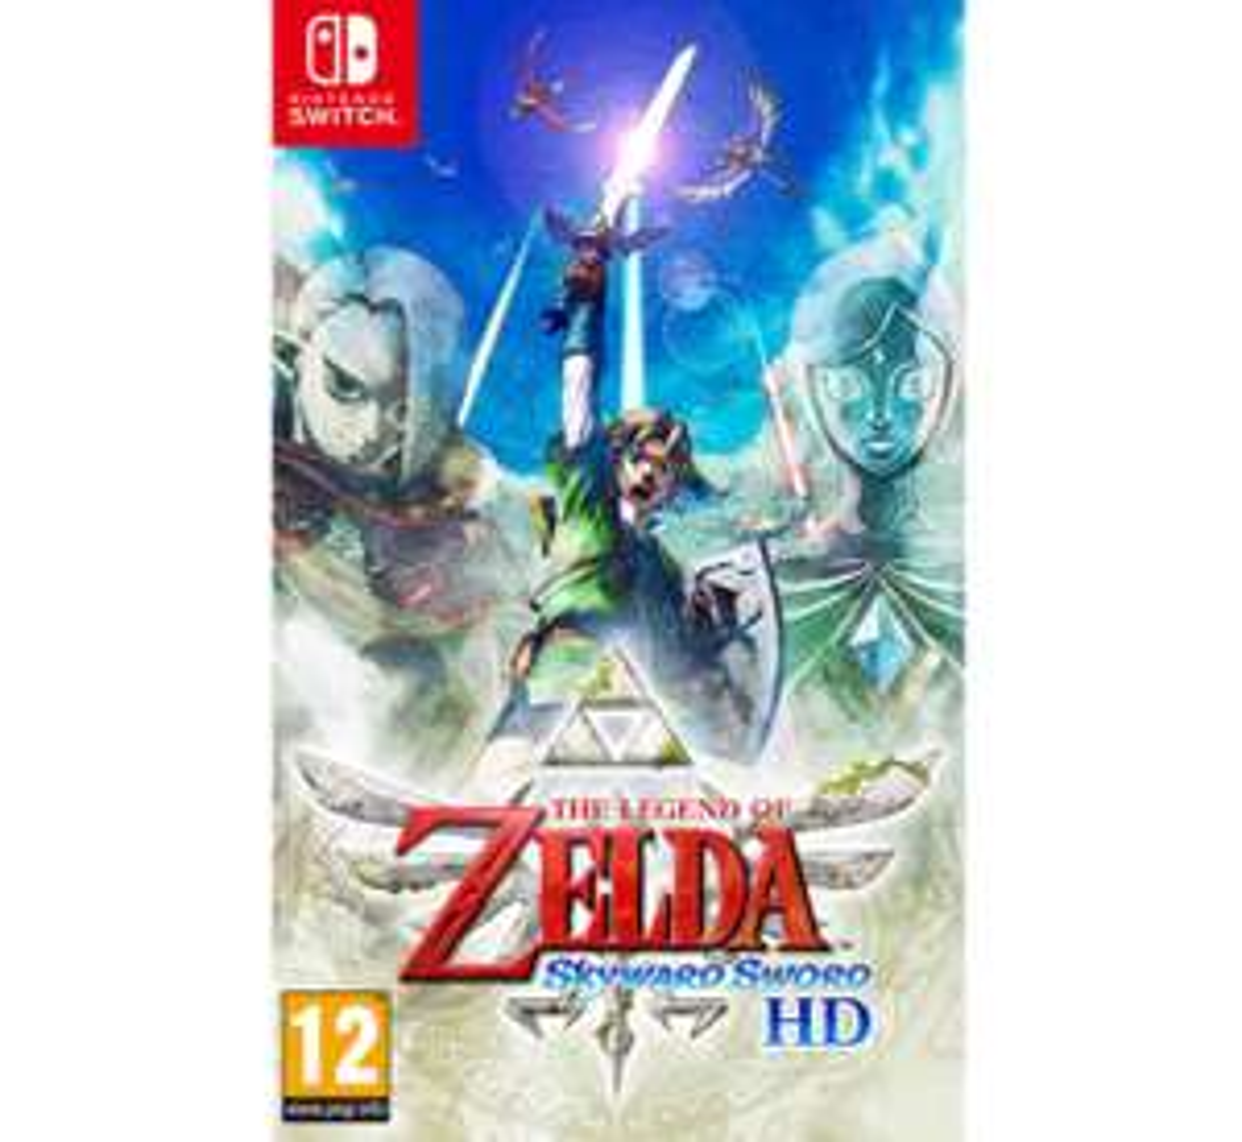 The Legend Of Zelda: Skyward Sword HD – Nintendo Switch Preorder £42.68 delivered @ Zatu Games